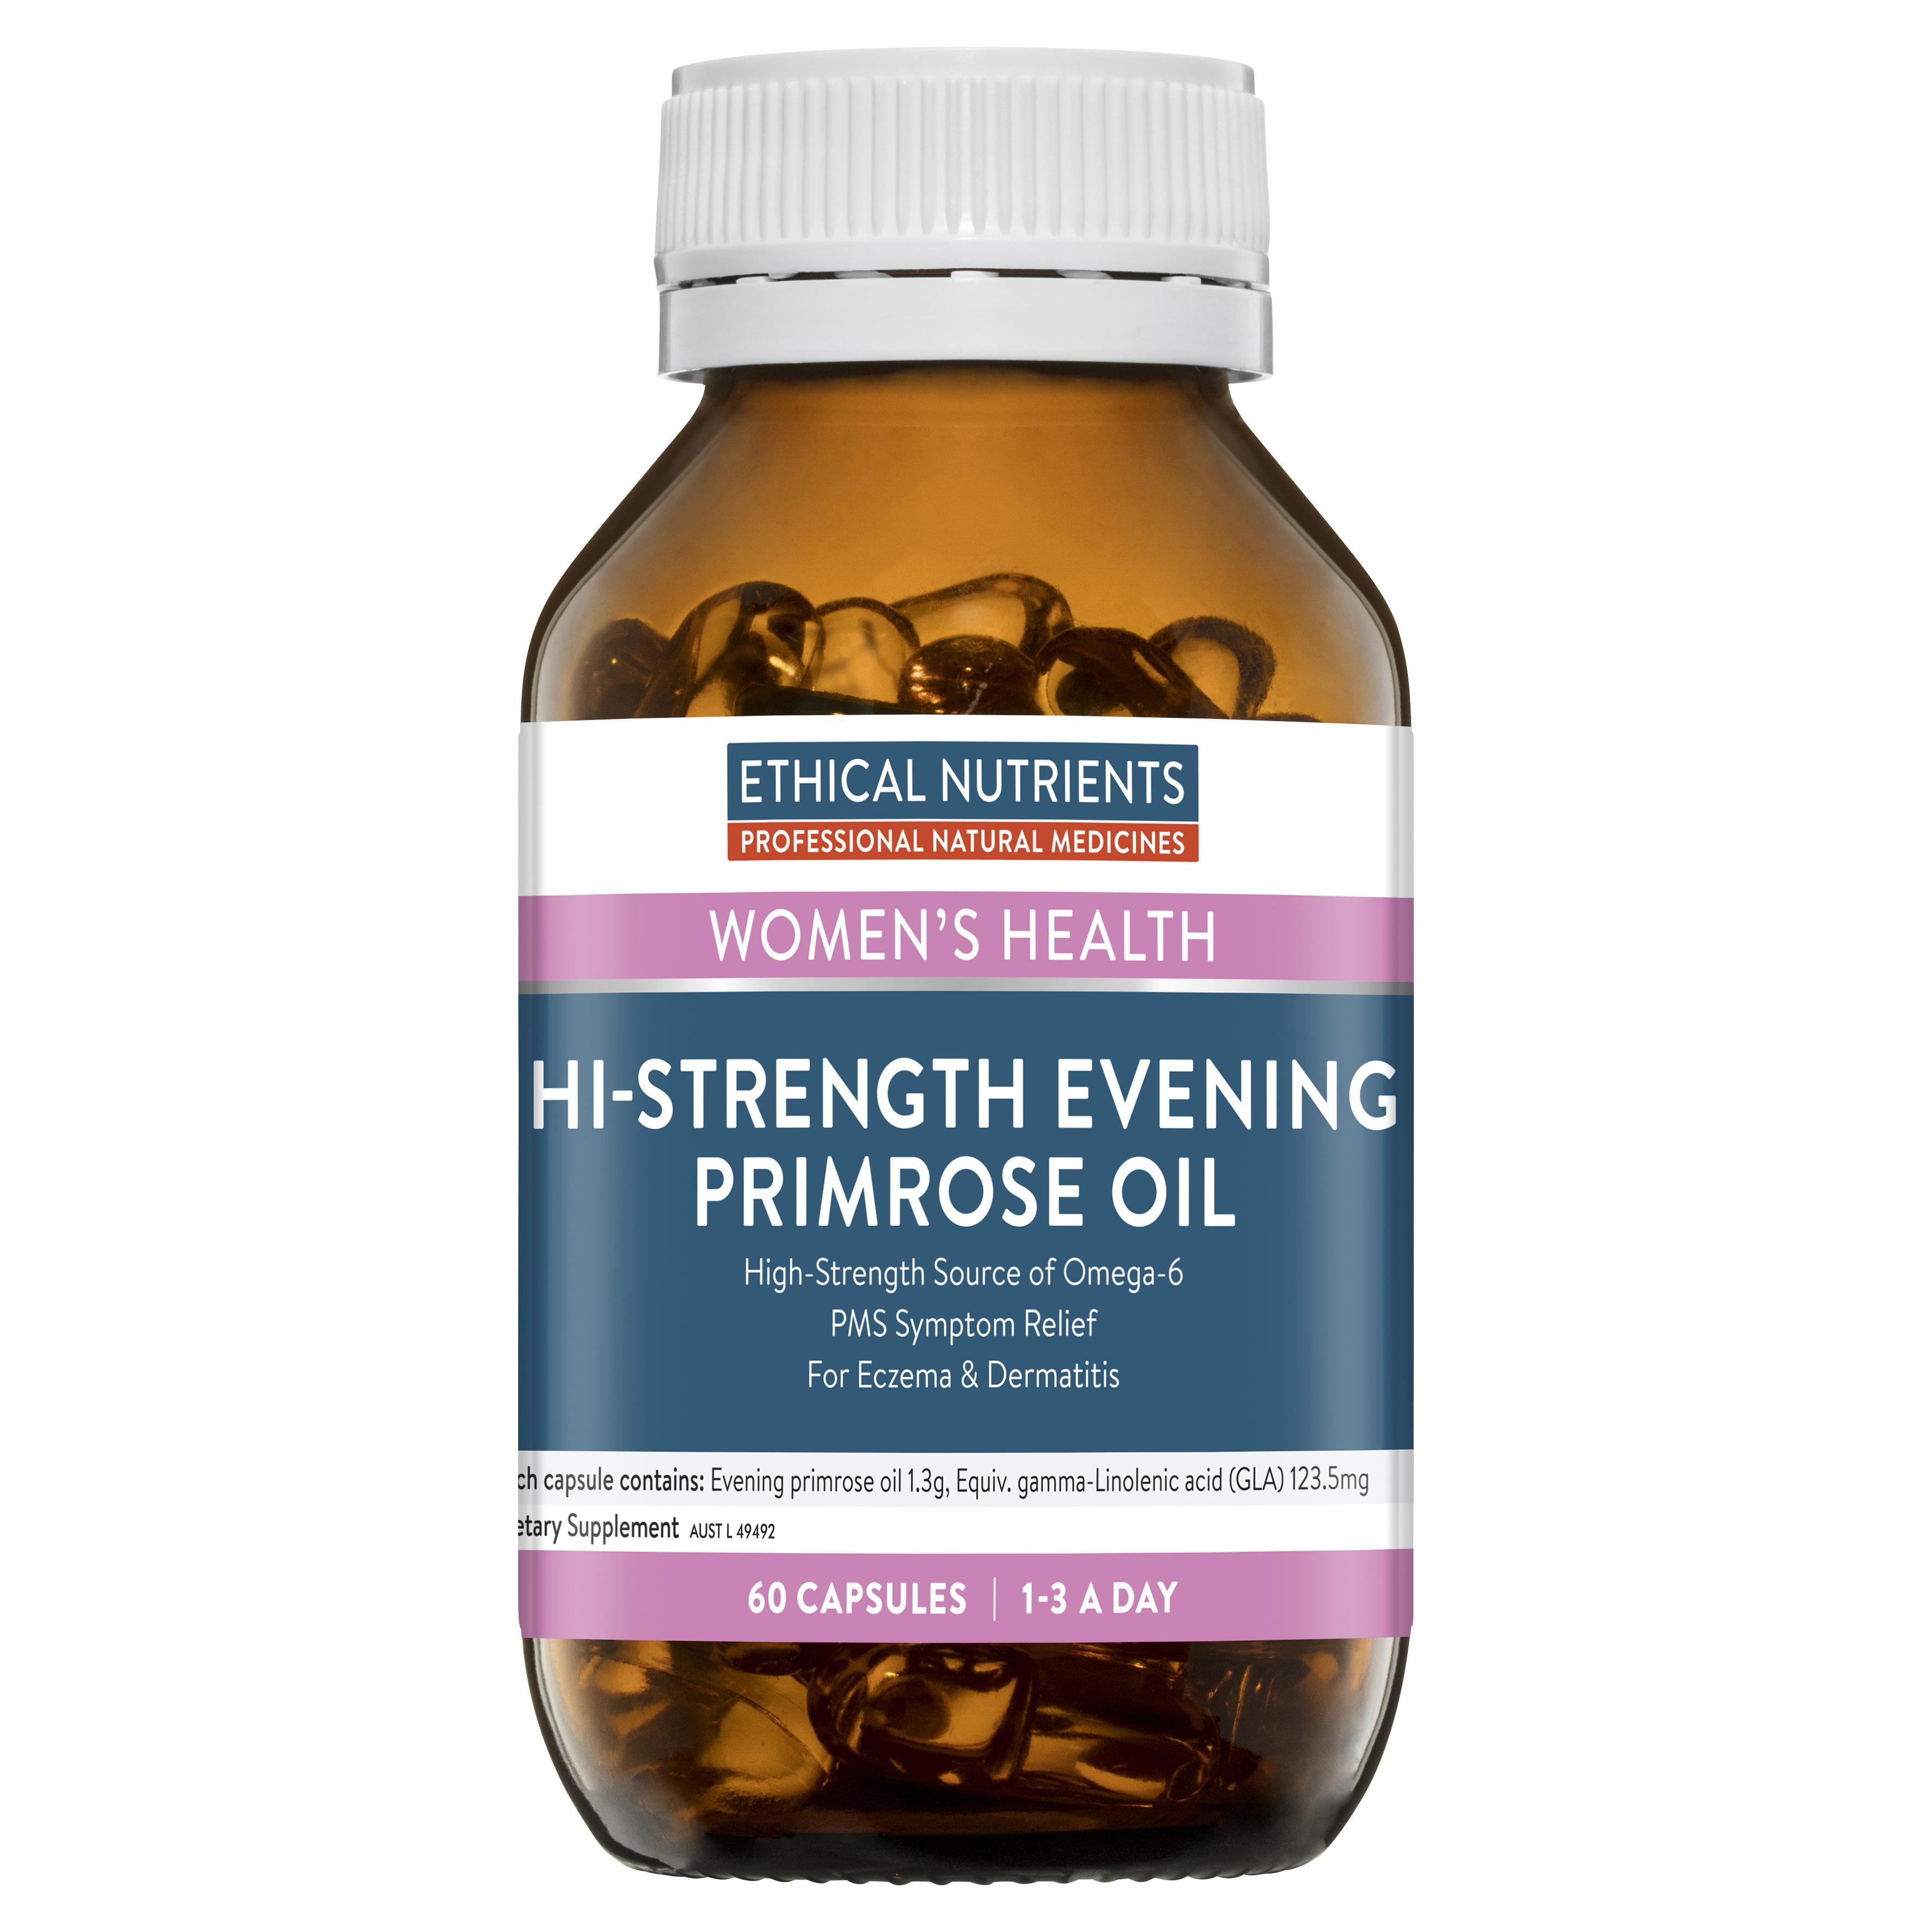 Ethical Nutrients Hi-Strength Evening Primrose Oil 60